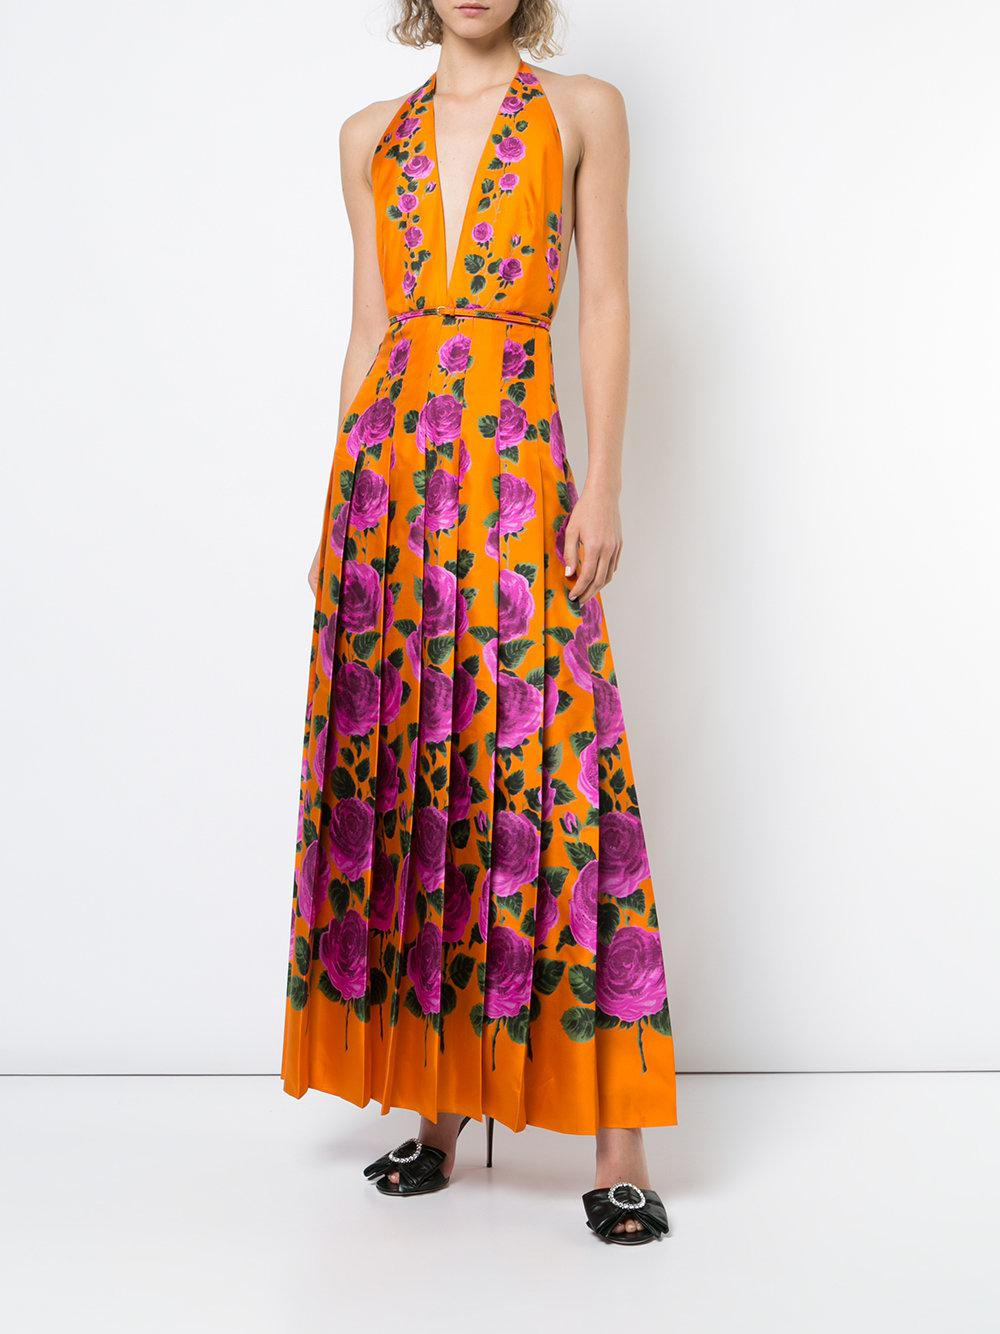 a160edc4a Gucci Rose Garden Print Dress in Orange - Lyst